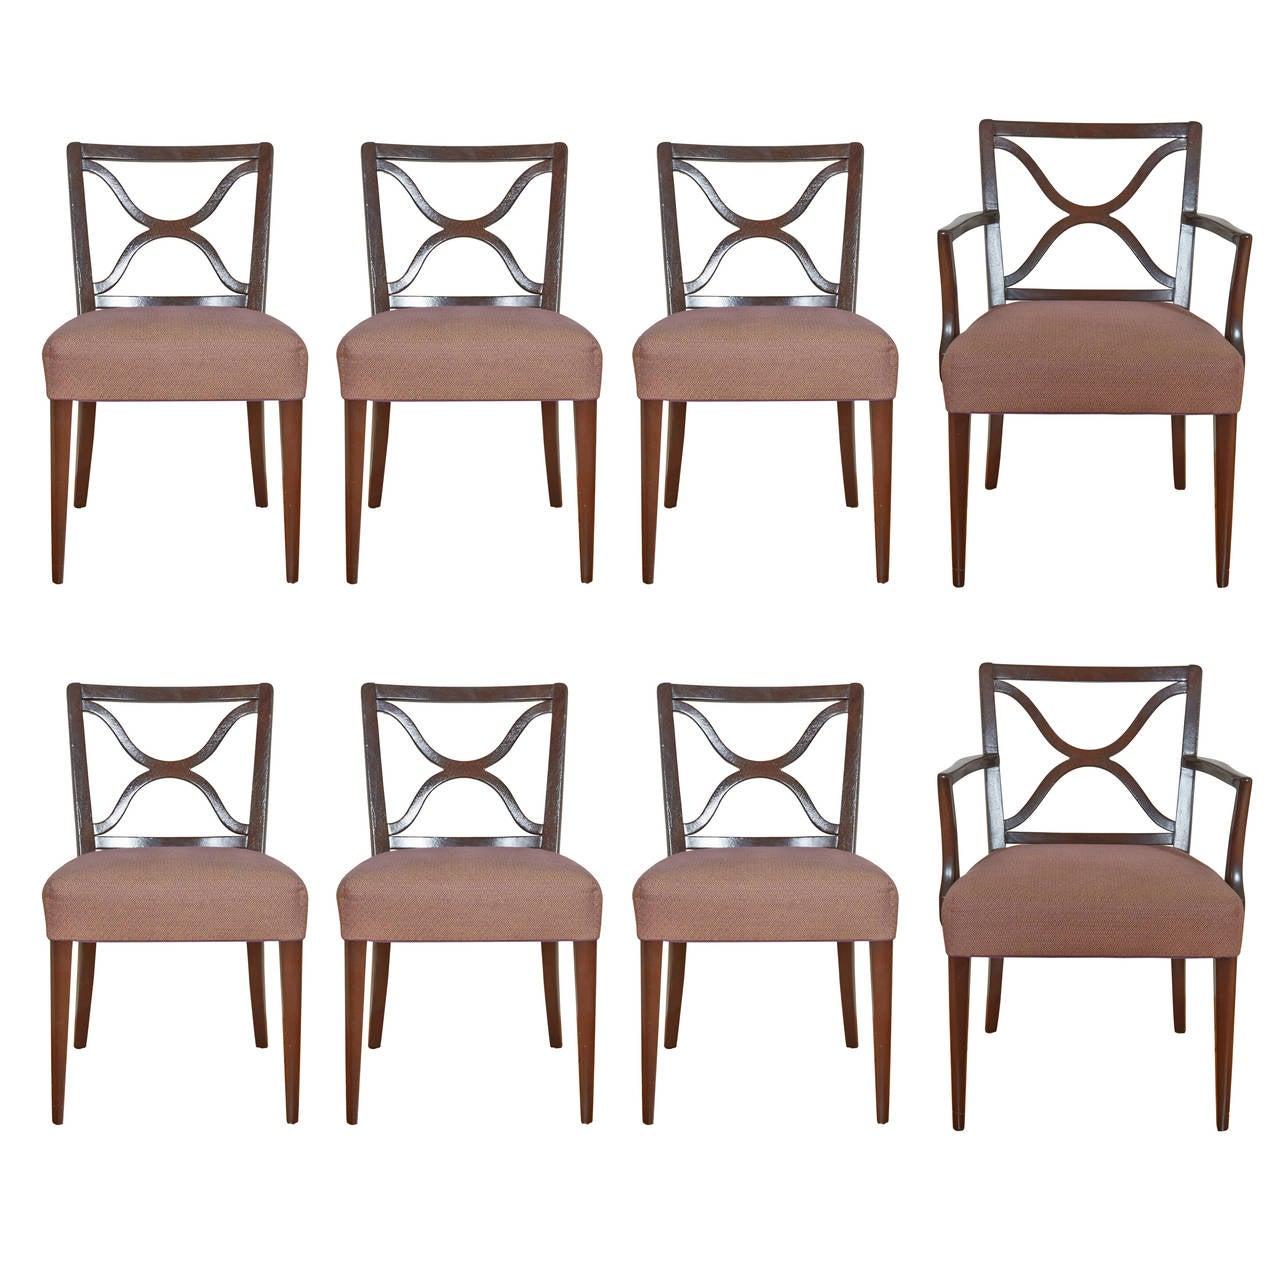 Set of Eight T.H. Robsjohn-Gibbings for Widdicomb Mahogany Dining Chairs